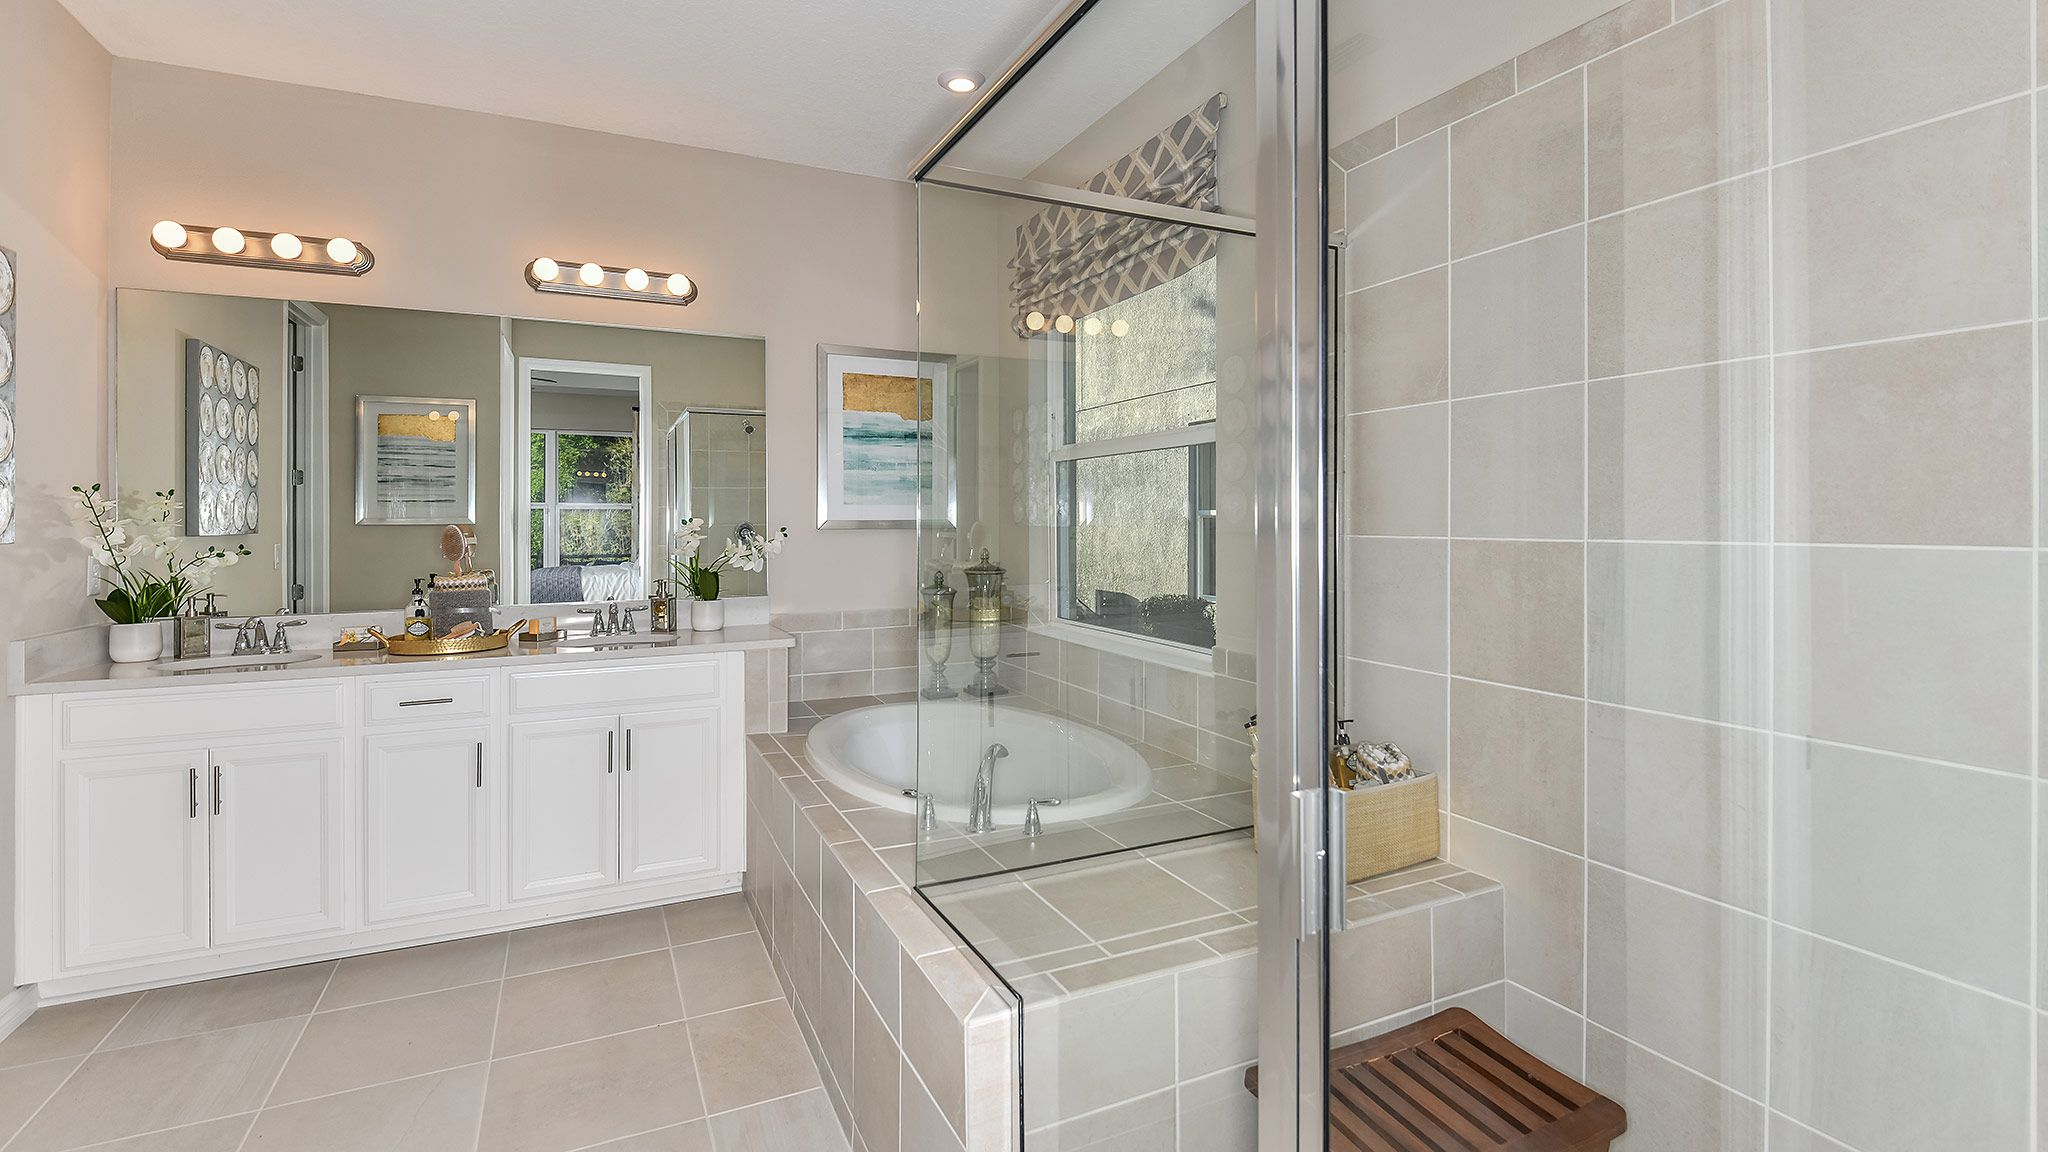 Bathroom featured in the Antigua Plan By Taylor Morrison in Sarasota-Bradenton, FL